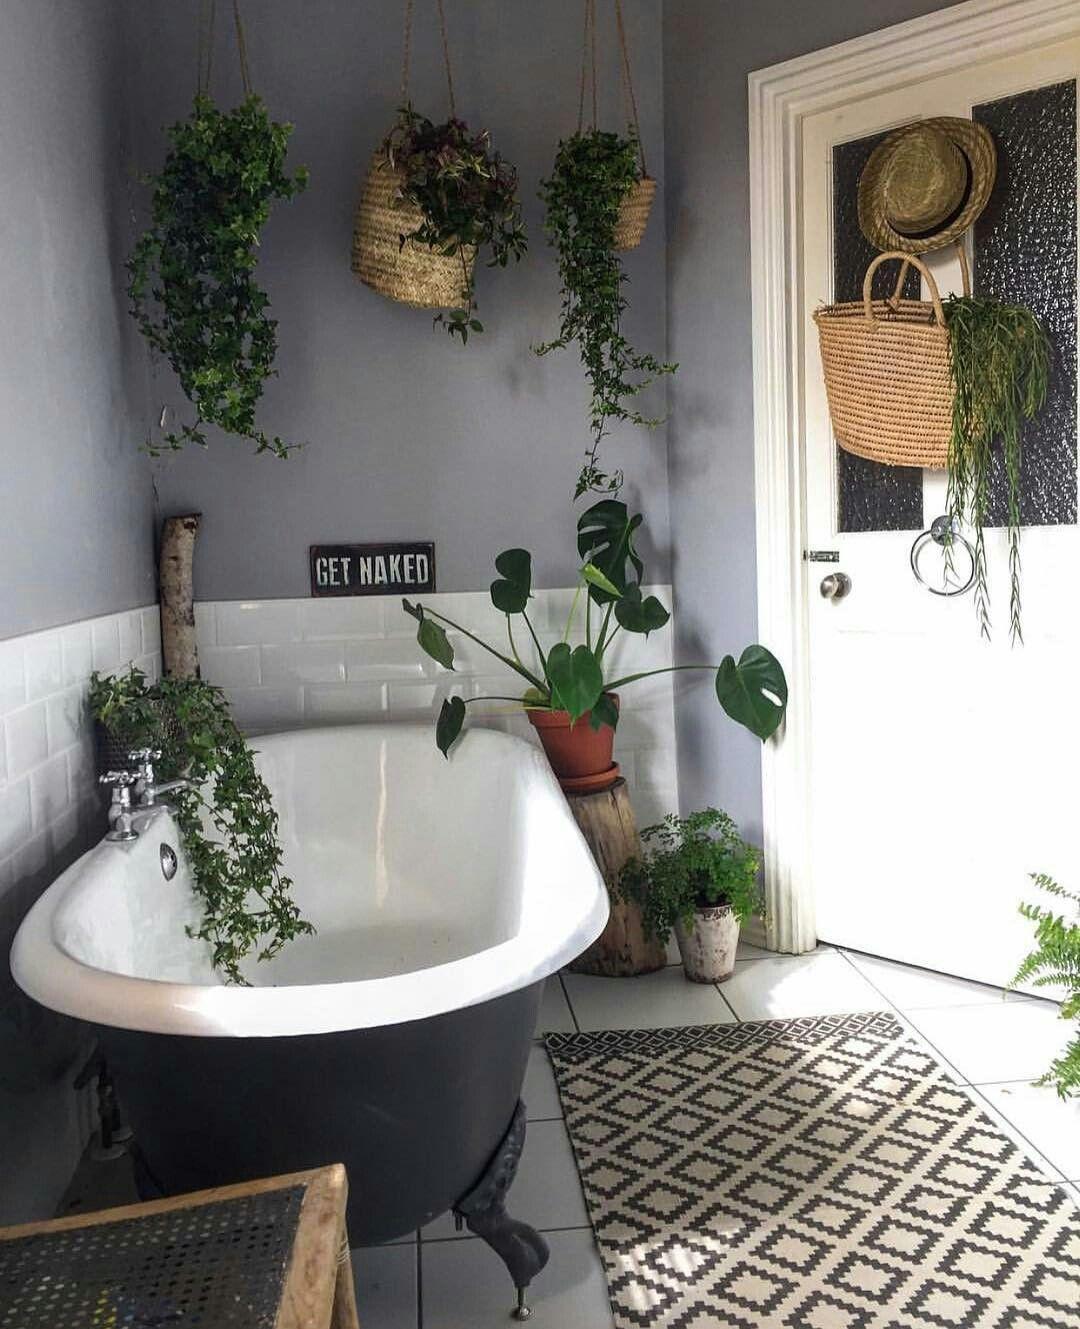 Pin by Aleshia Sbragia on House   Cozy bathroom, Bathroom ...